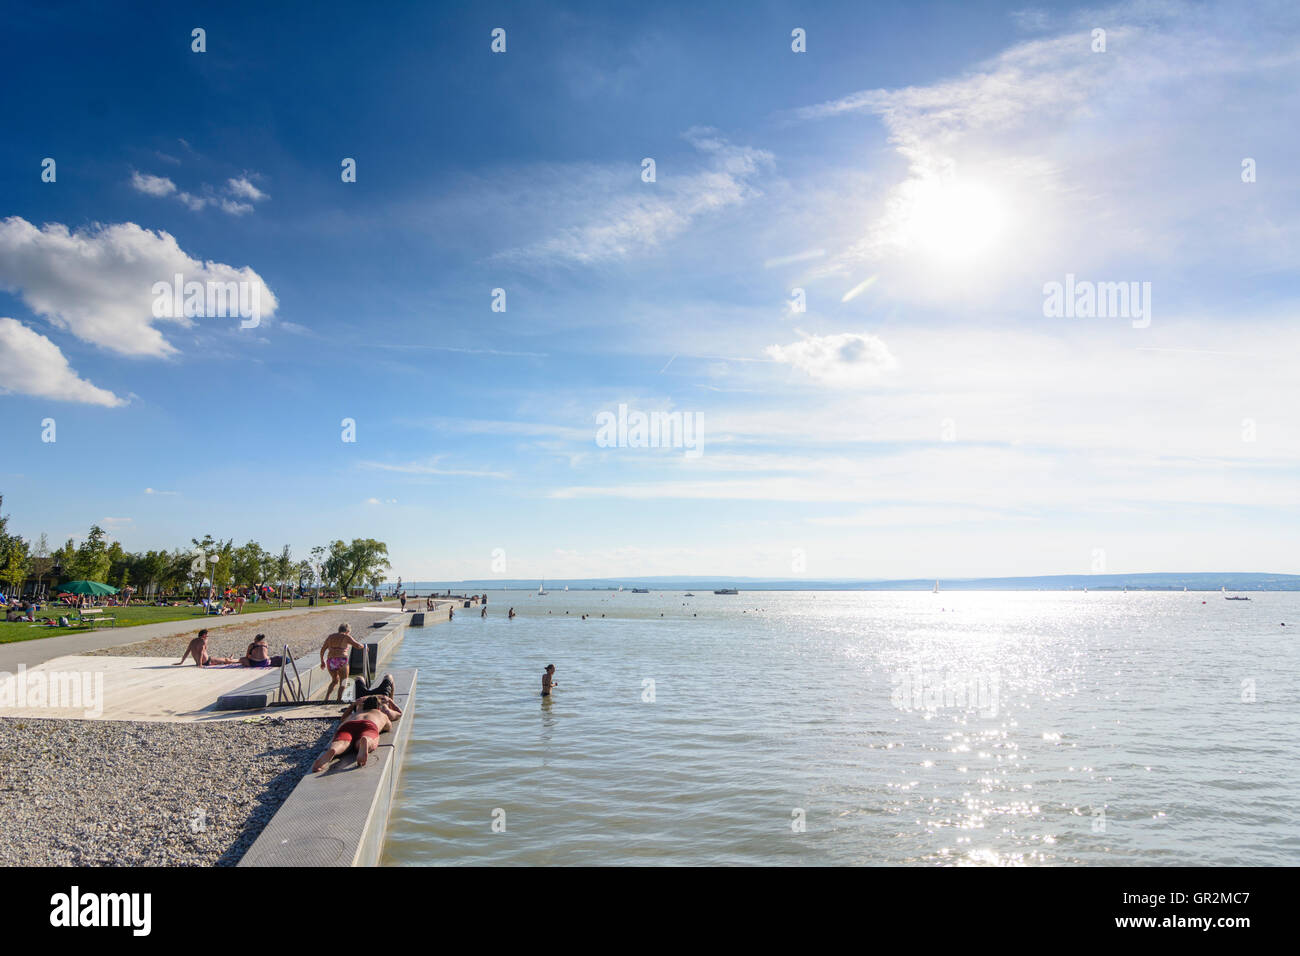 Illmitz: public bathing beach lido, Lake Neusiedl, Neusiedler See, swimmer, sailboat, sunbather, Austria, Burgenland, - Stock Image